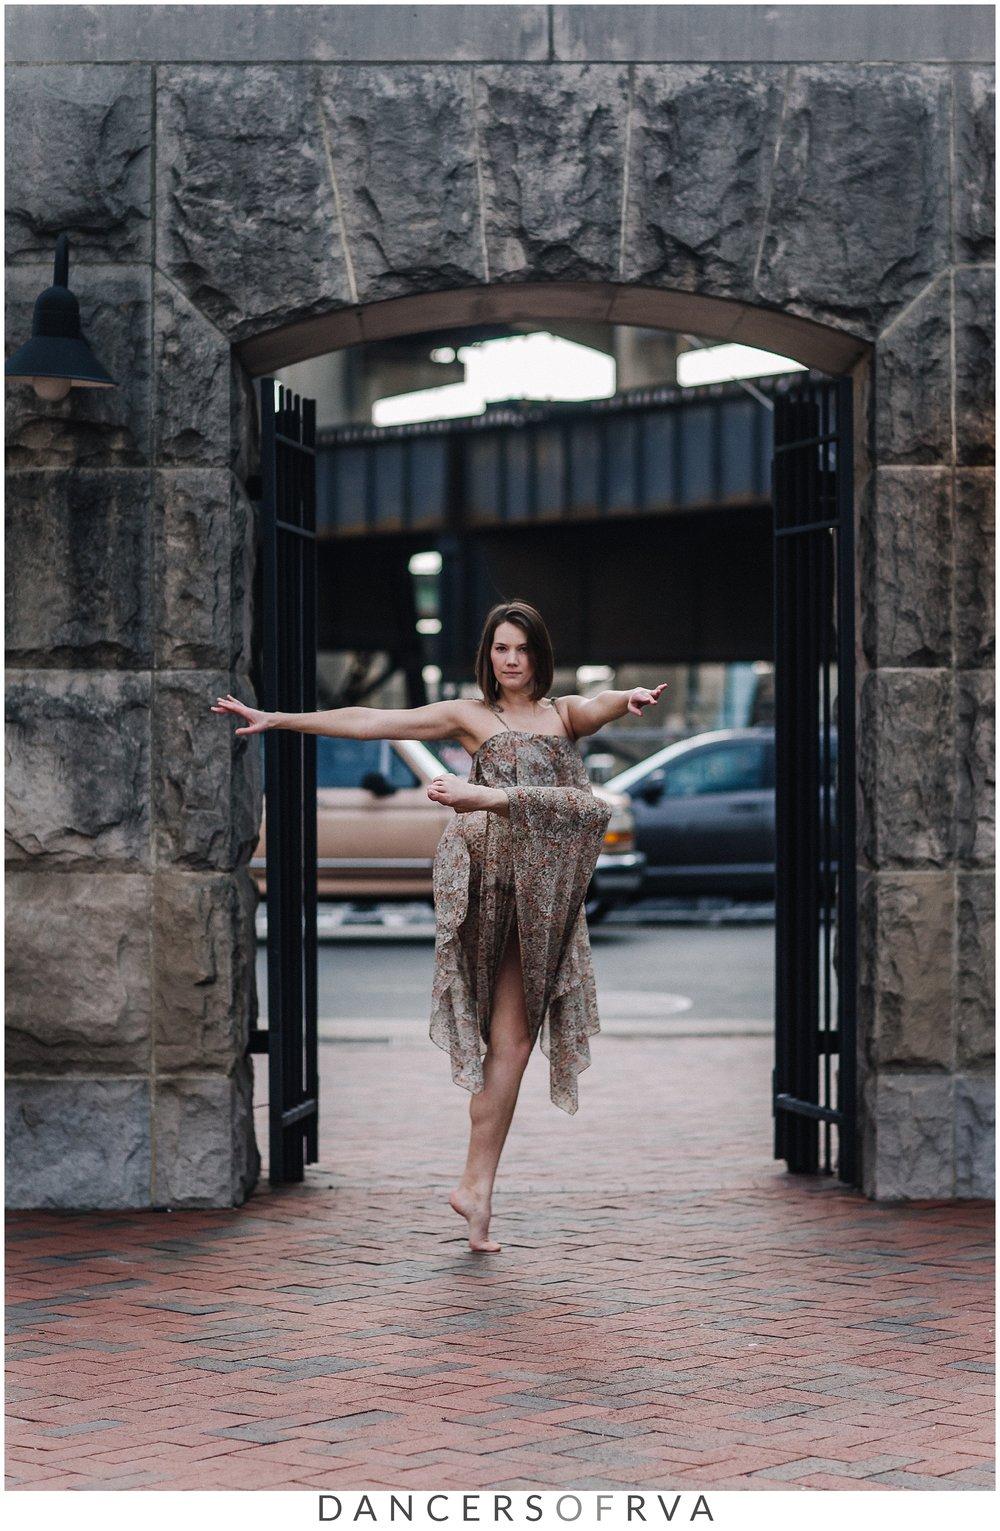 Richmond-Main-Street-Station-Dance-Photographer-Dancers-of-RVA_0009.jpg